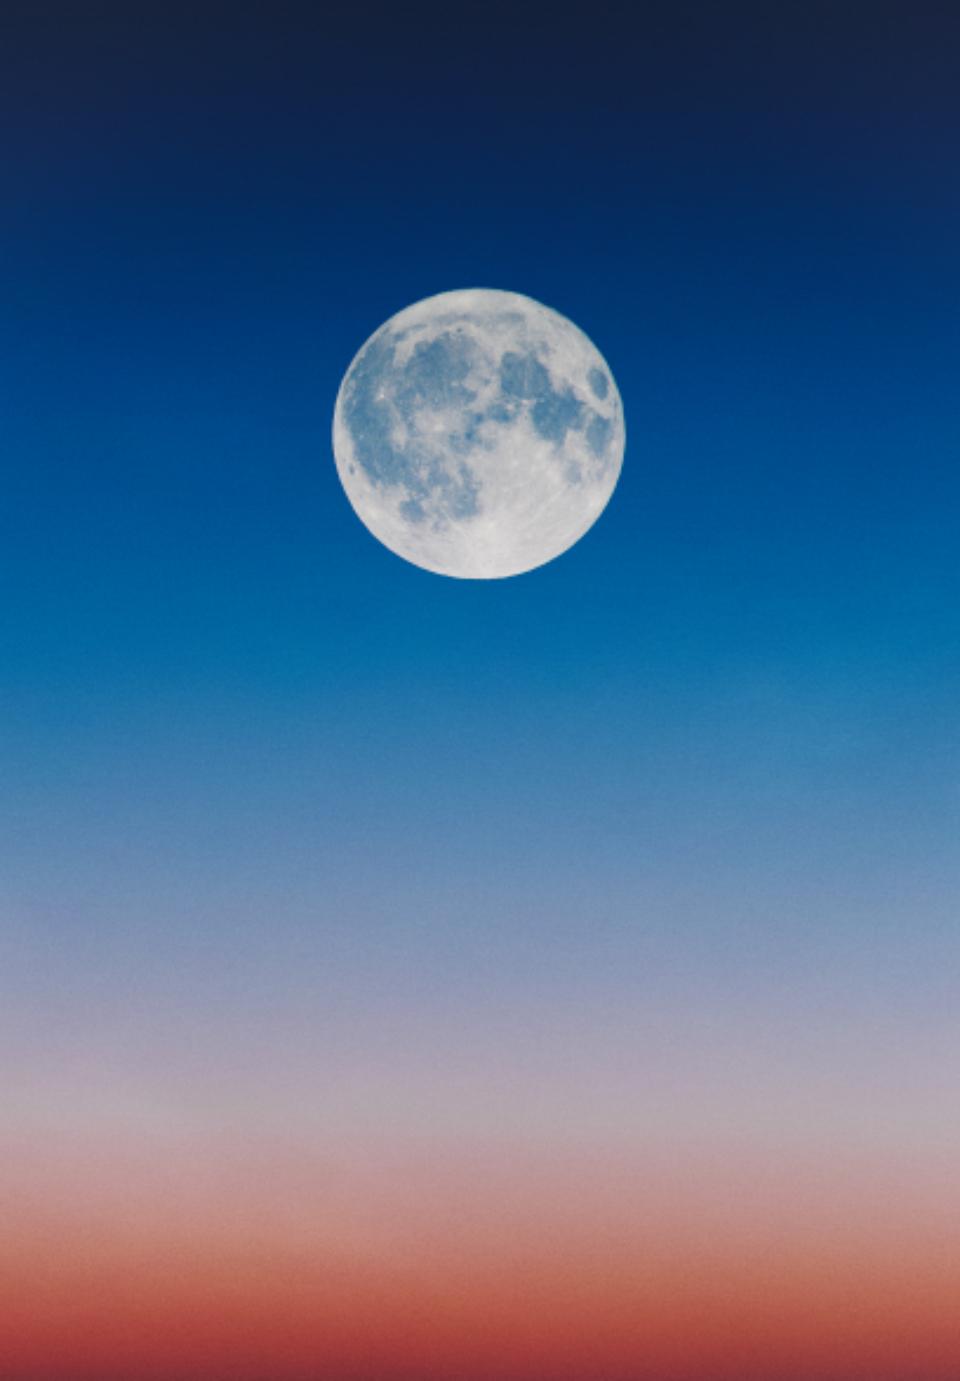 Fall Mountaons In The Sun Wallpaper Free Photo Of Full Moon Dawn Wallpaper Stocksnap Io